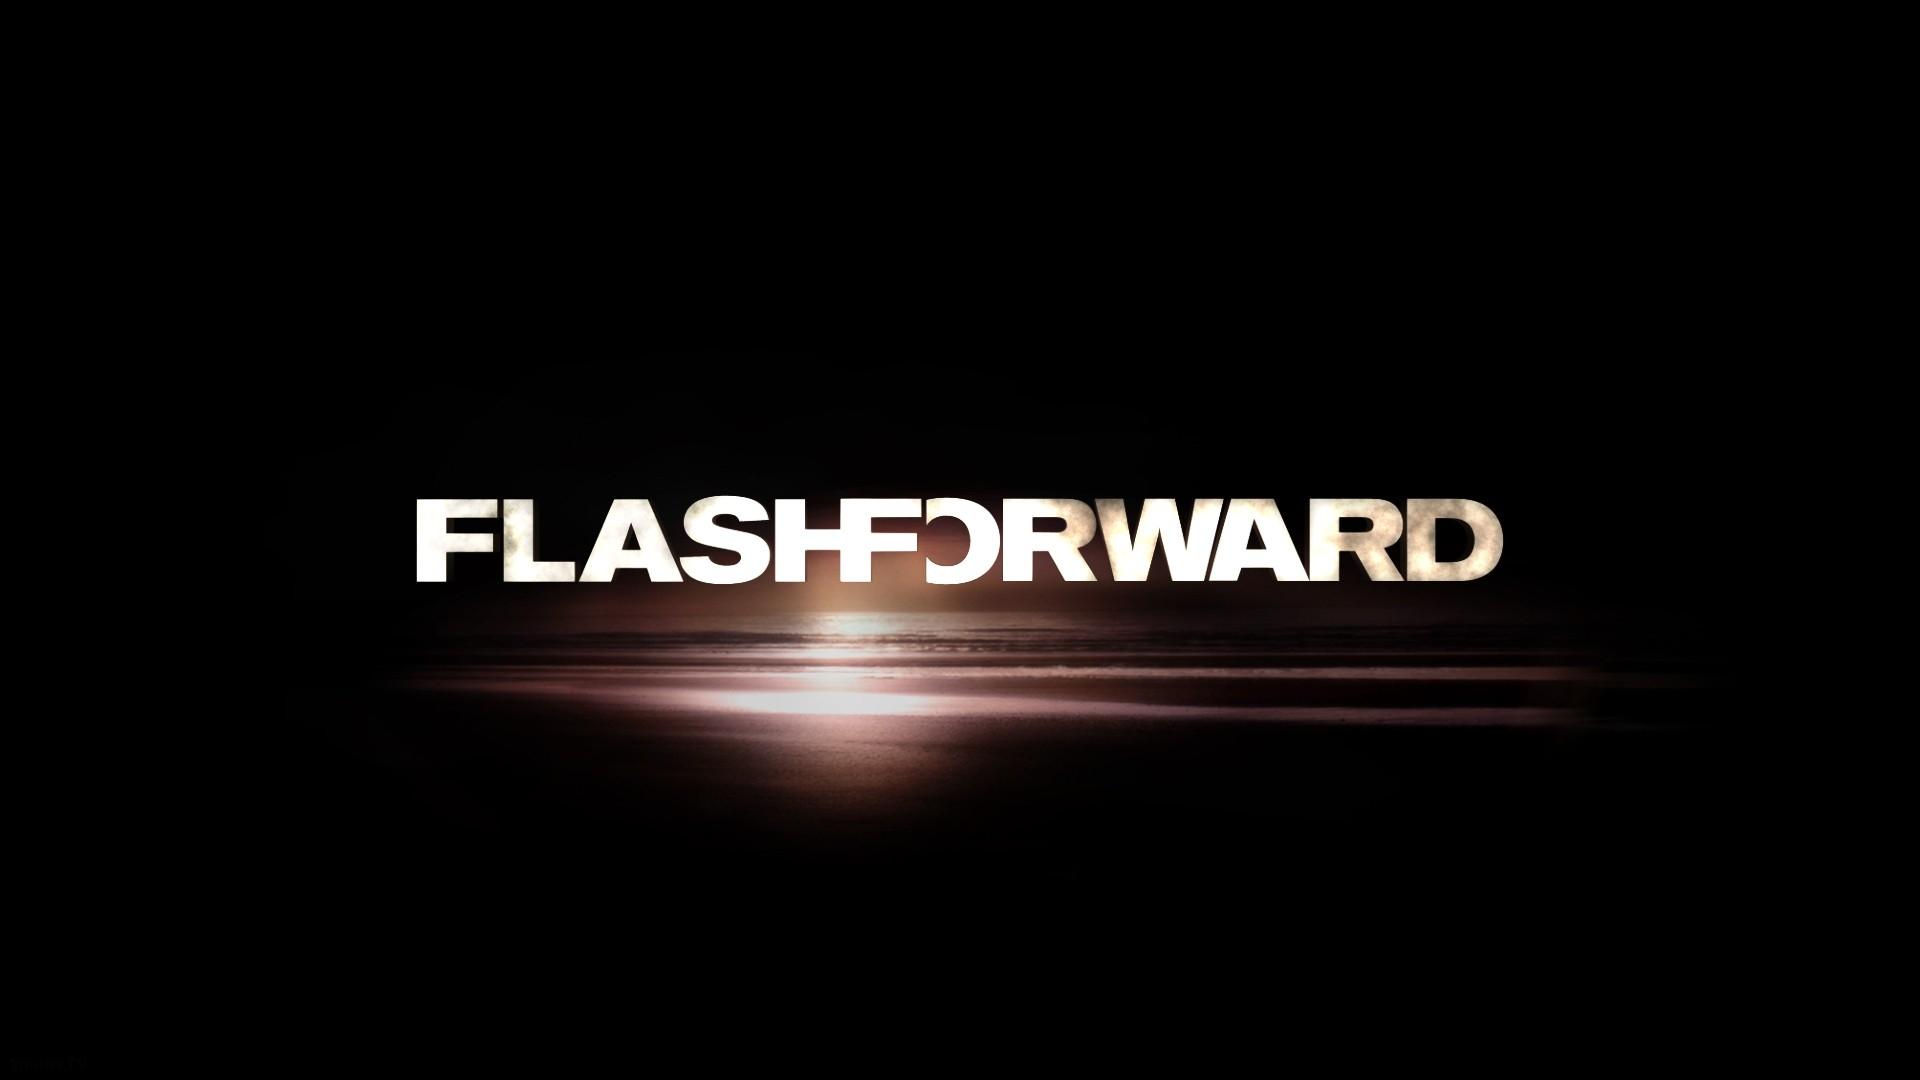 Risultati immagini per flashforward